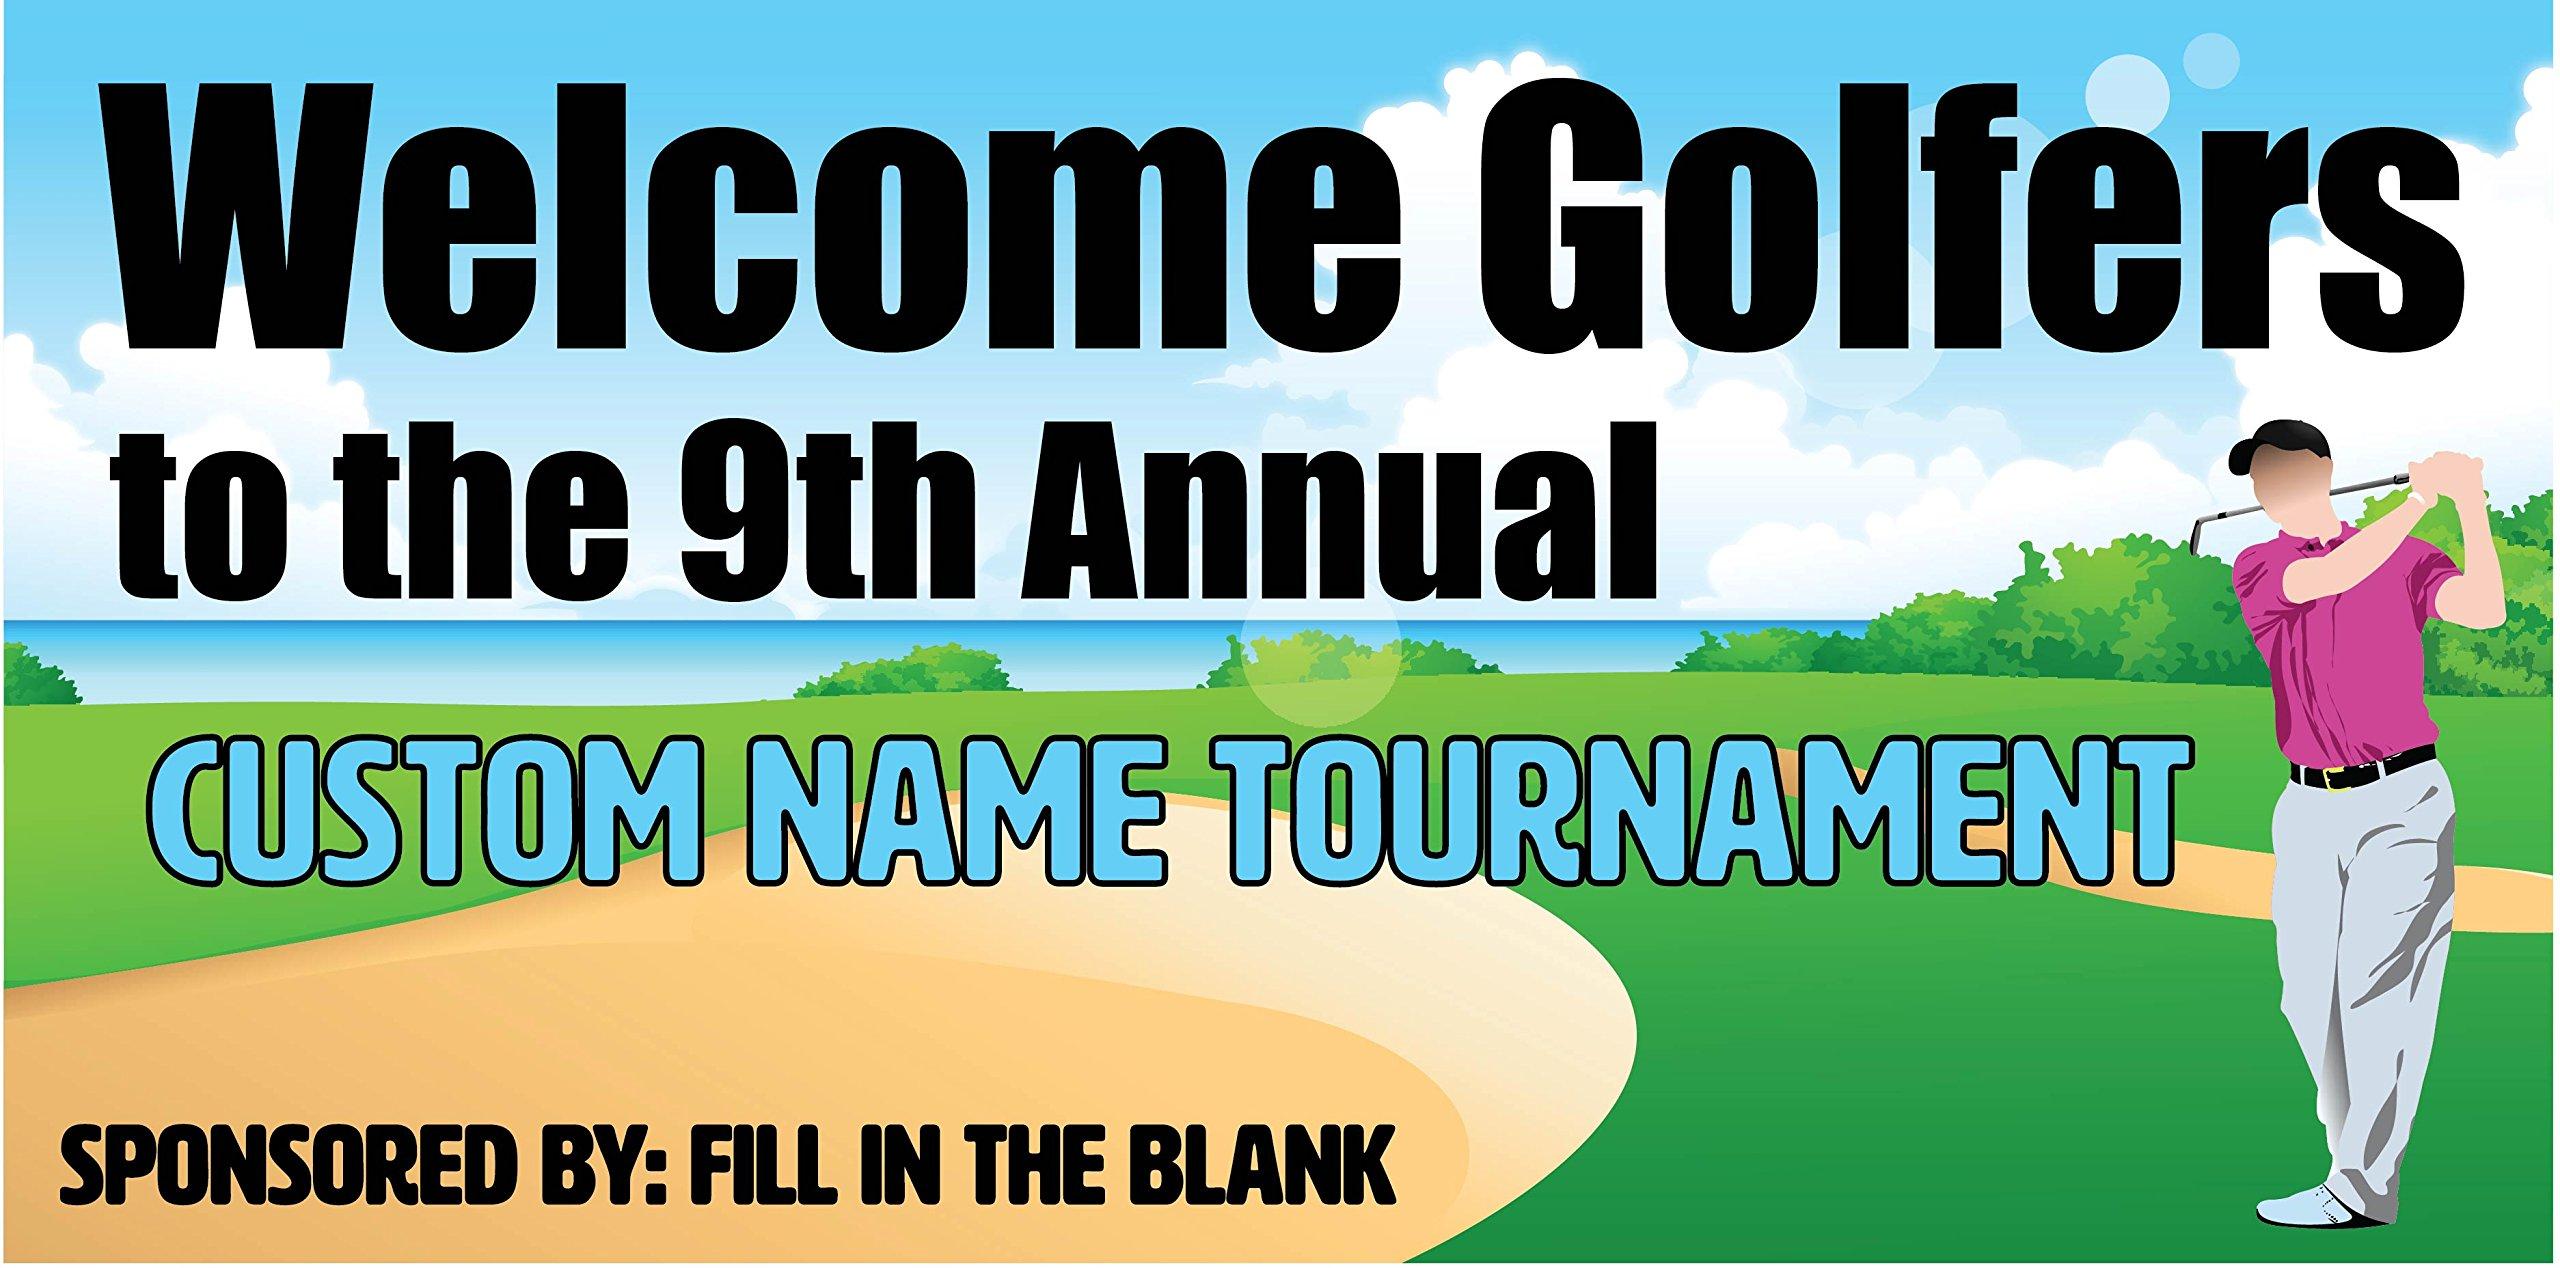 Custom Printed Golf Tournament Banner - Beach (10' x 5')